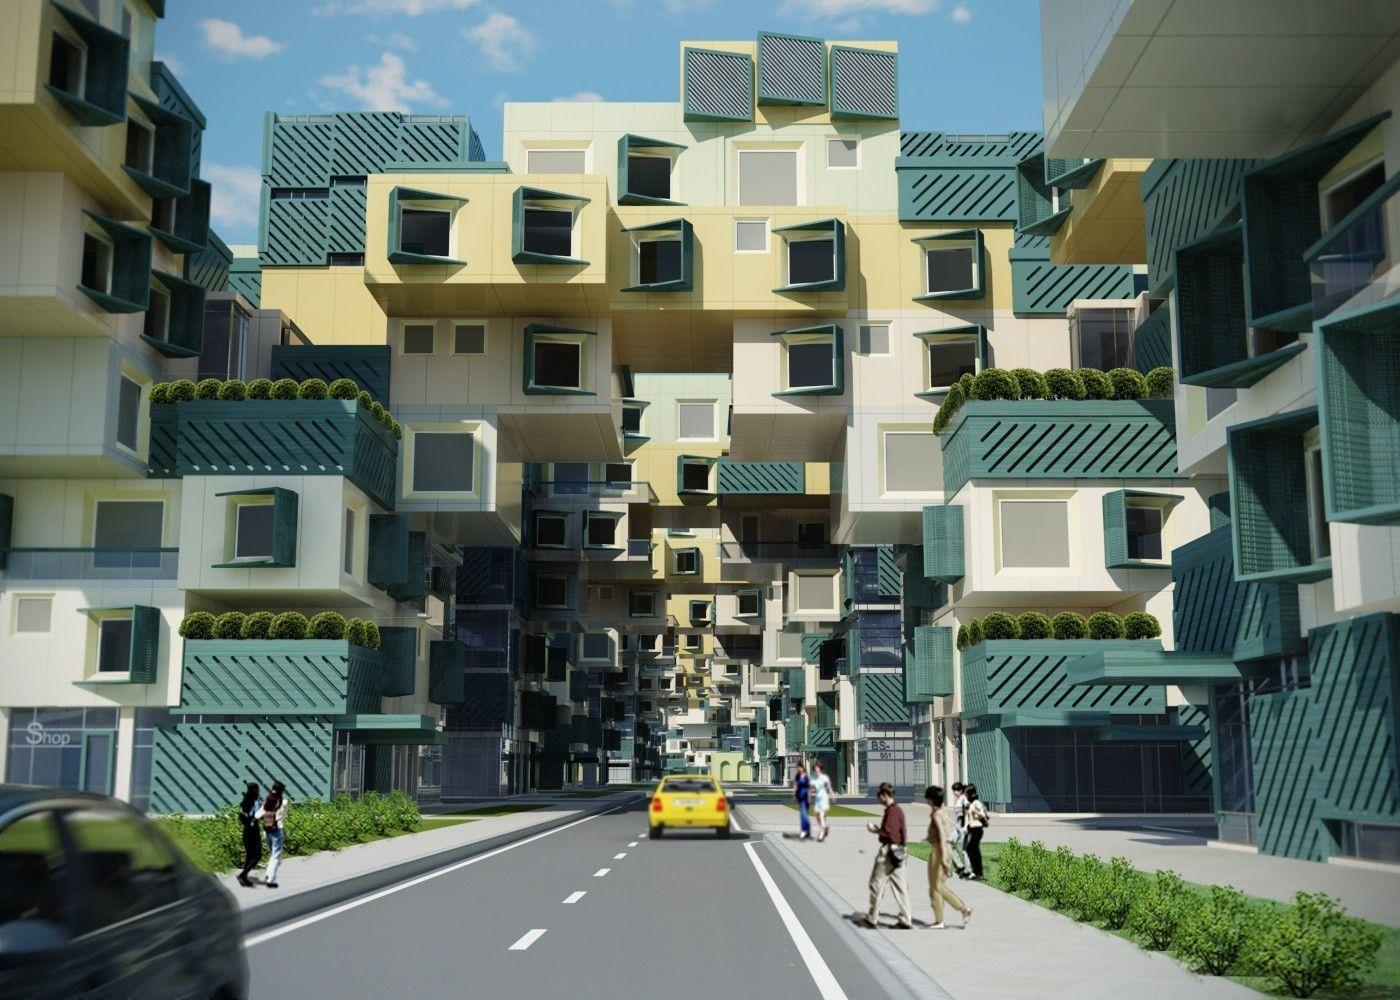 Habitat Düsseldorf un habitat announces winners of mass housing competition